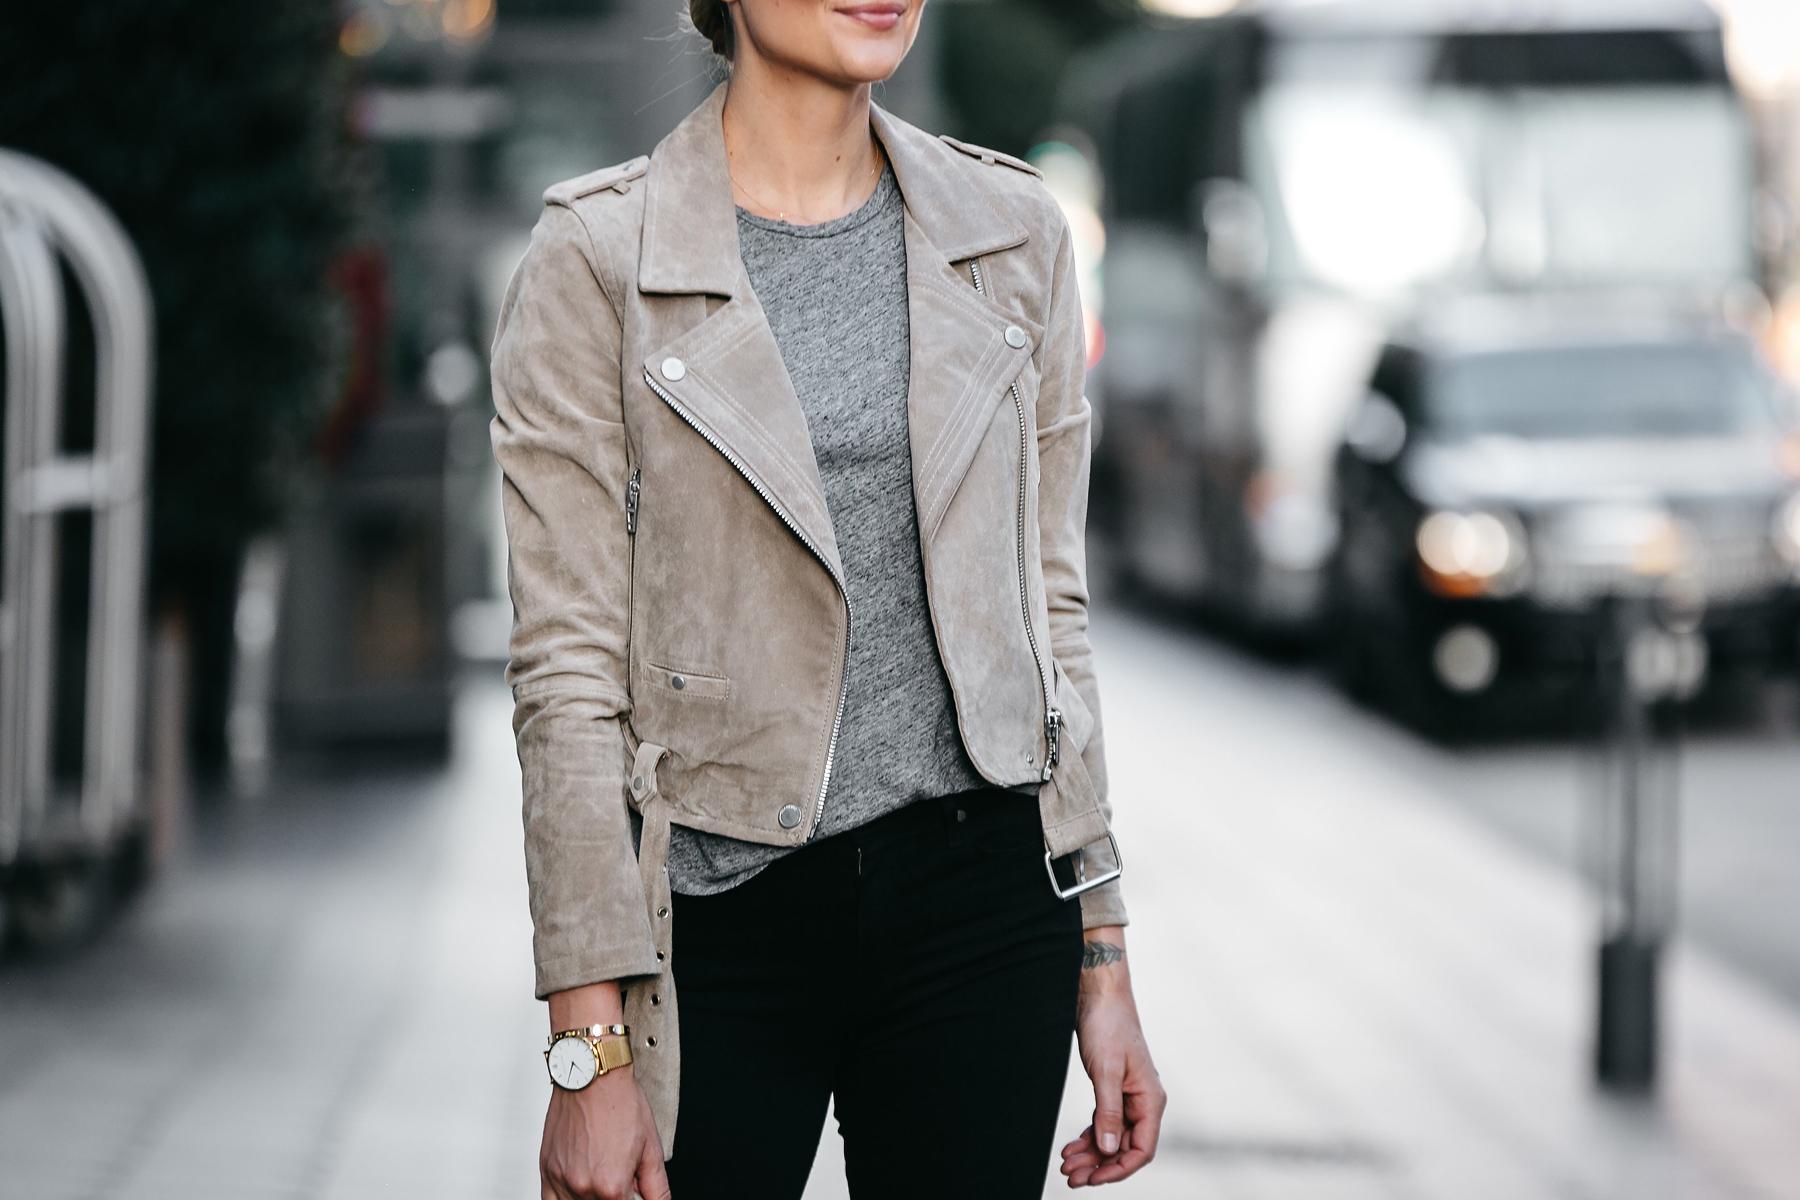 Blanknyc Tan Suede Moto Jacket Grey Tshirt Outfit Fashion Jackson Dallas Blogger Fashion Blogger Street Style